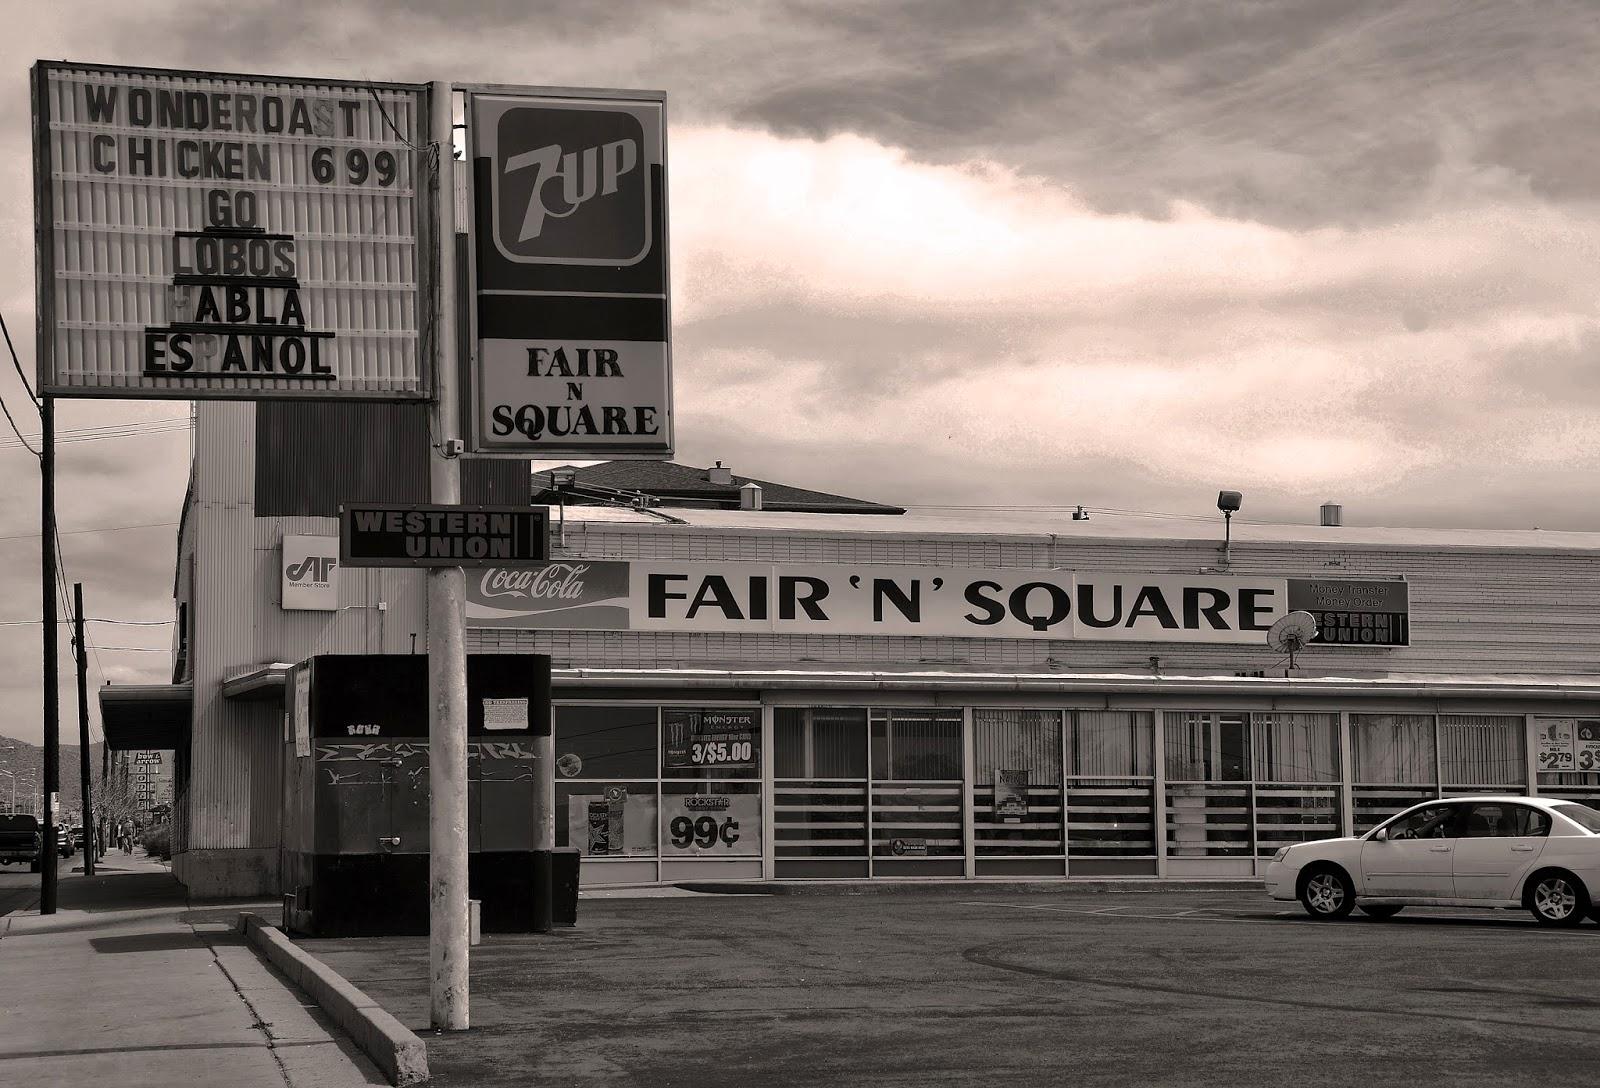 Heidi Utz, Albuquerque photography, fair n square, albuquerque photos